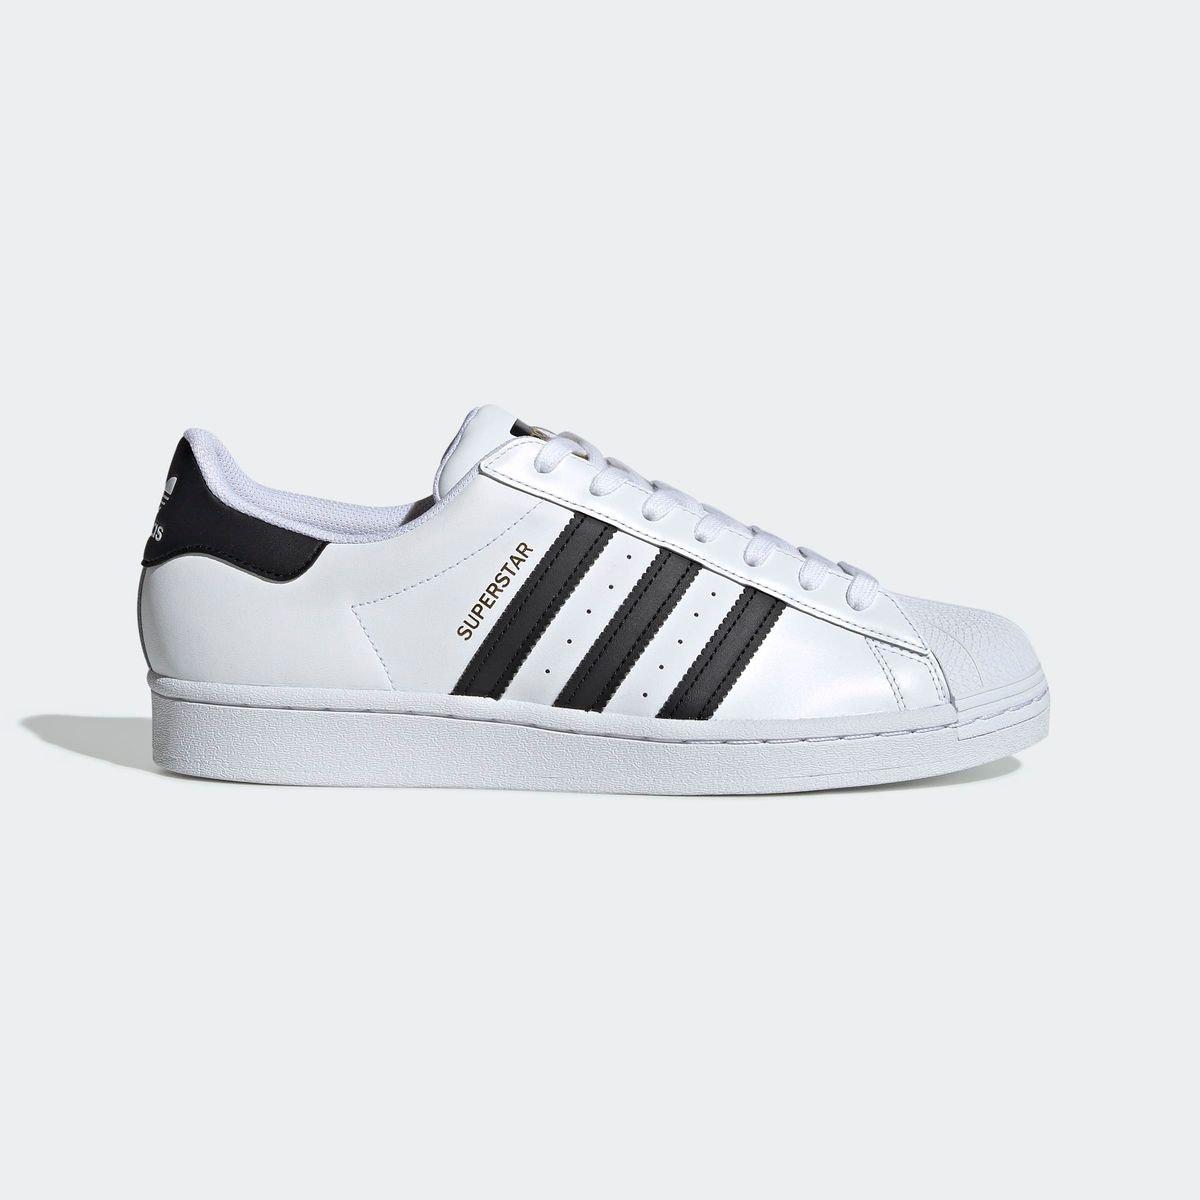 Adidas superstar homme   La Redoute